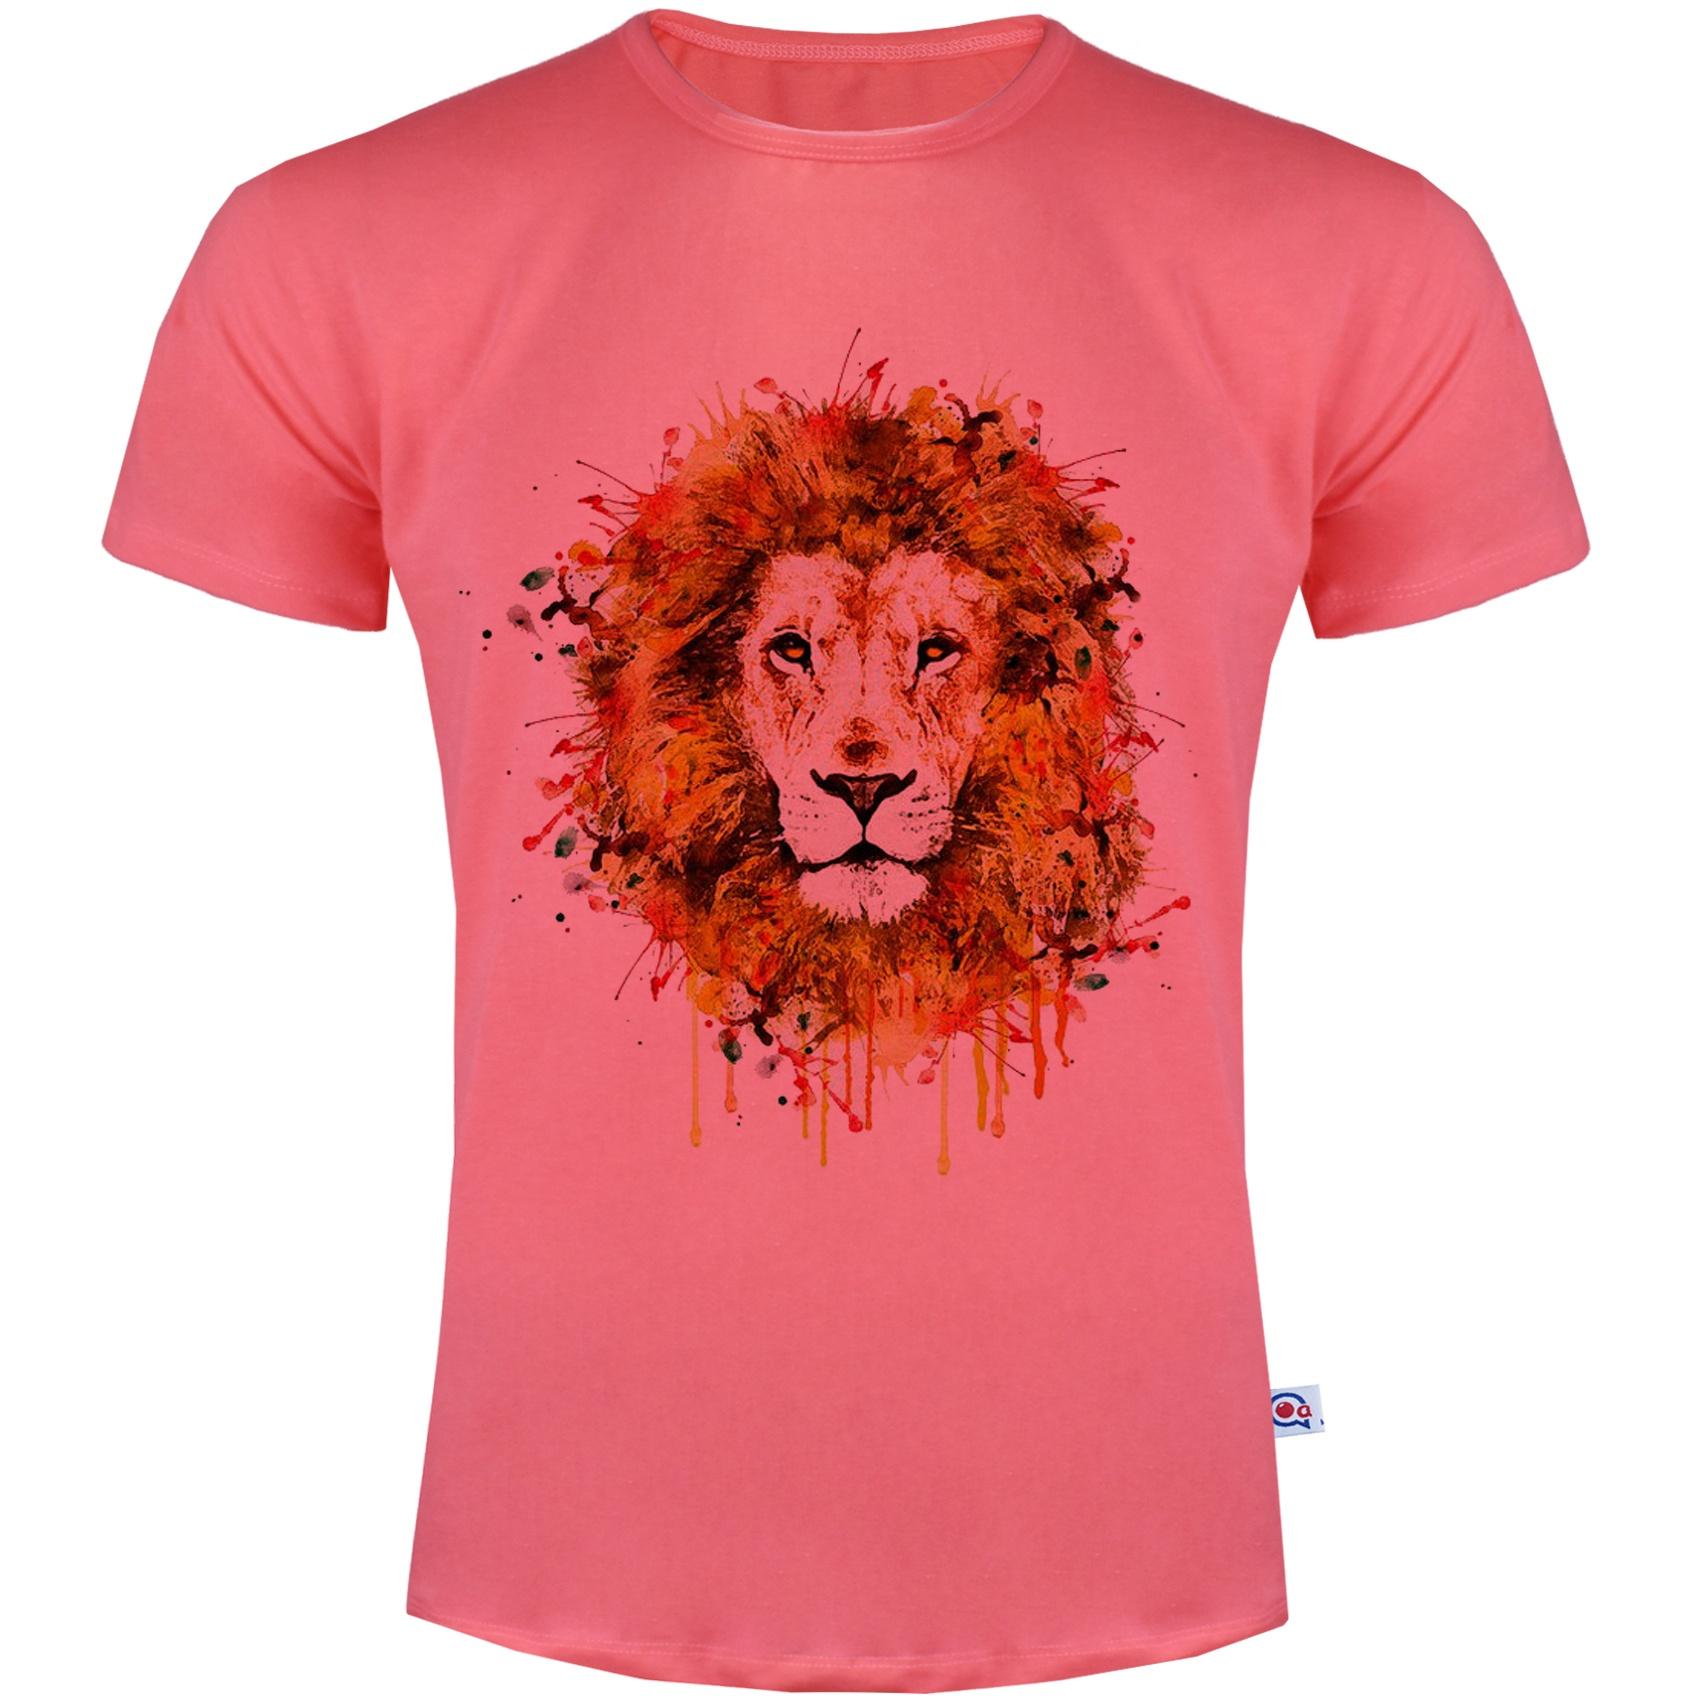 Photo of تی شرت مردانه آکو طرح شیر کد SG71